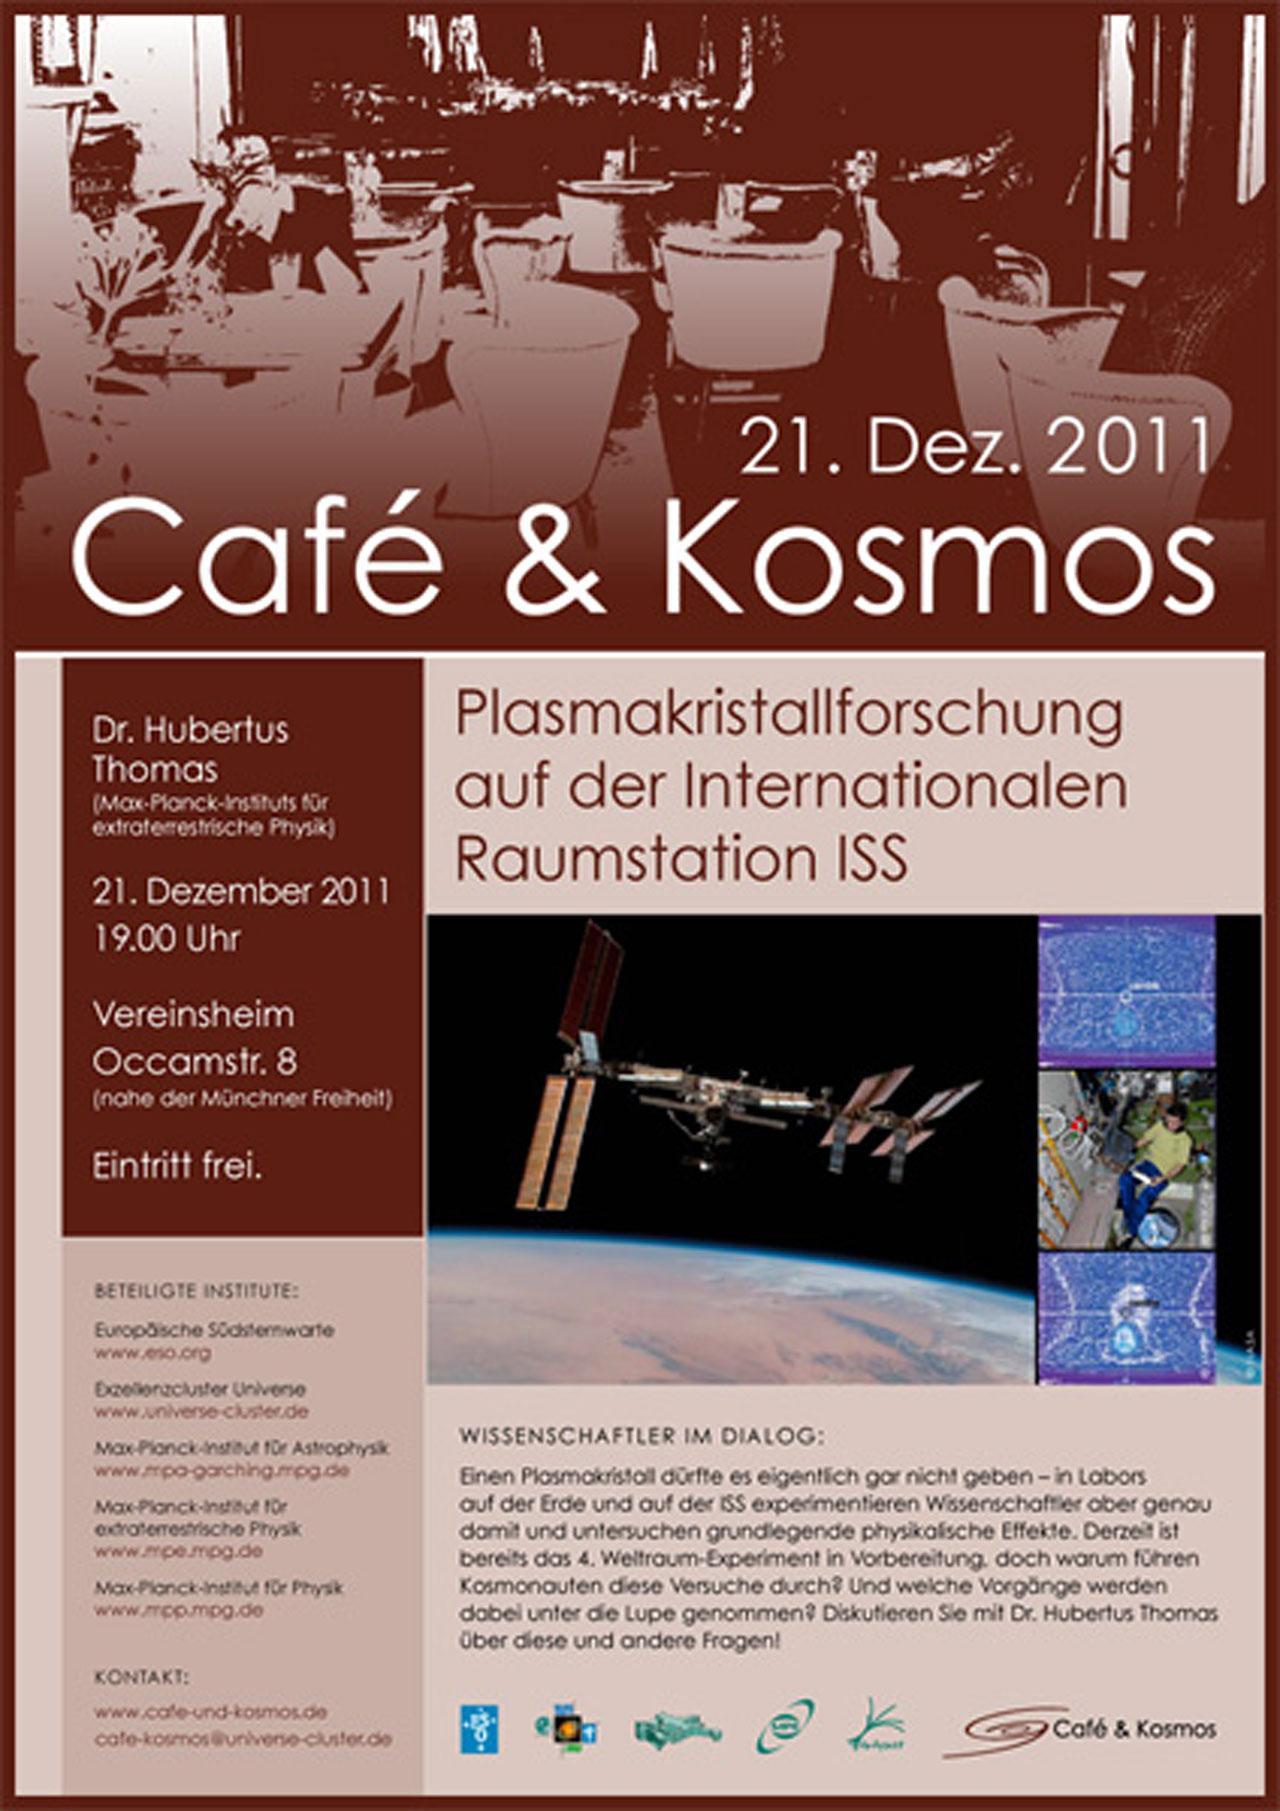 Poster of Café & Kosmos 21 December 2011